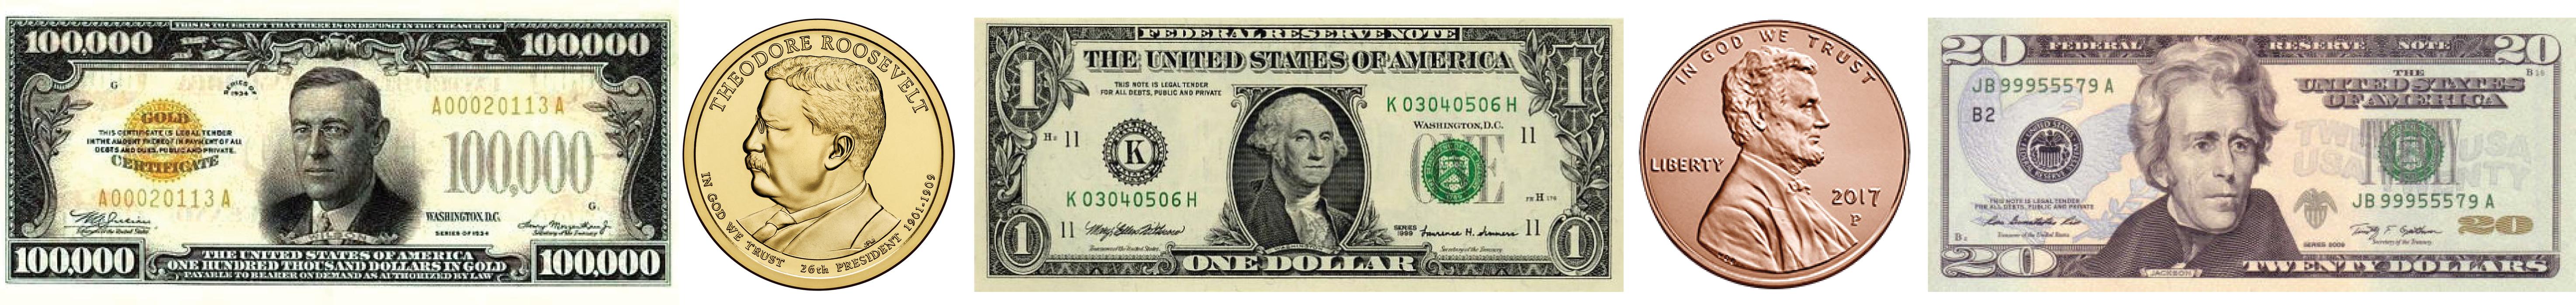 presidents on us paper money